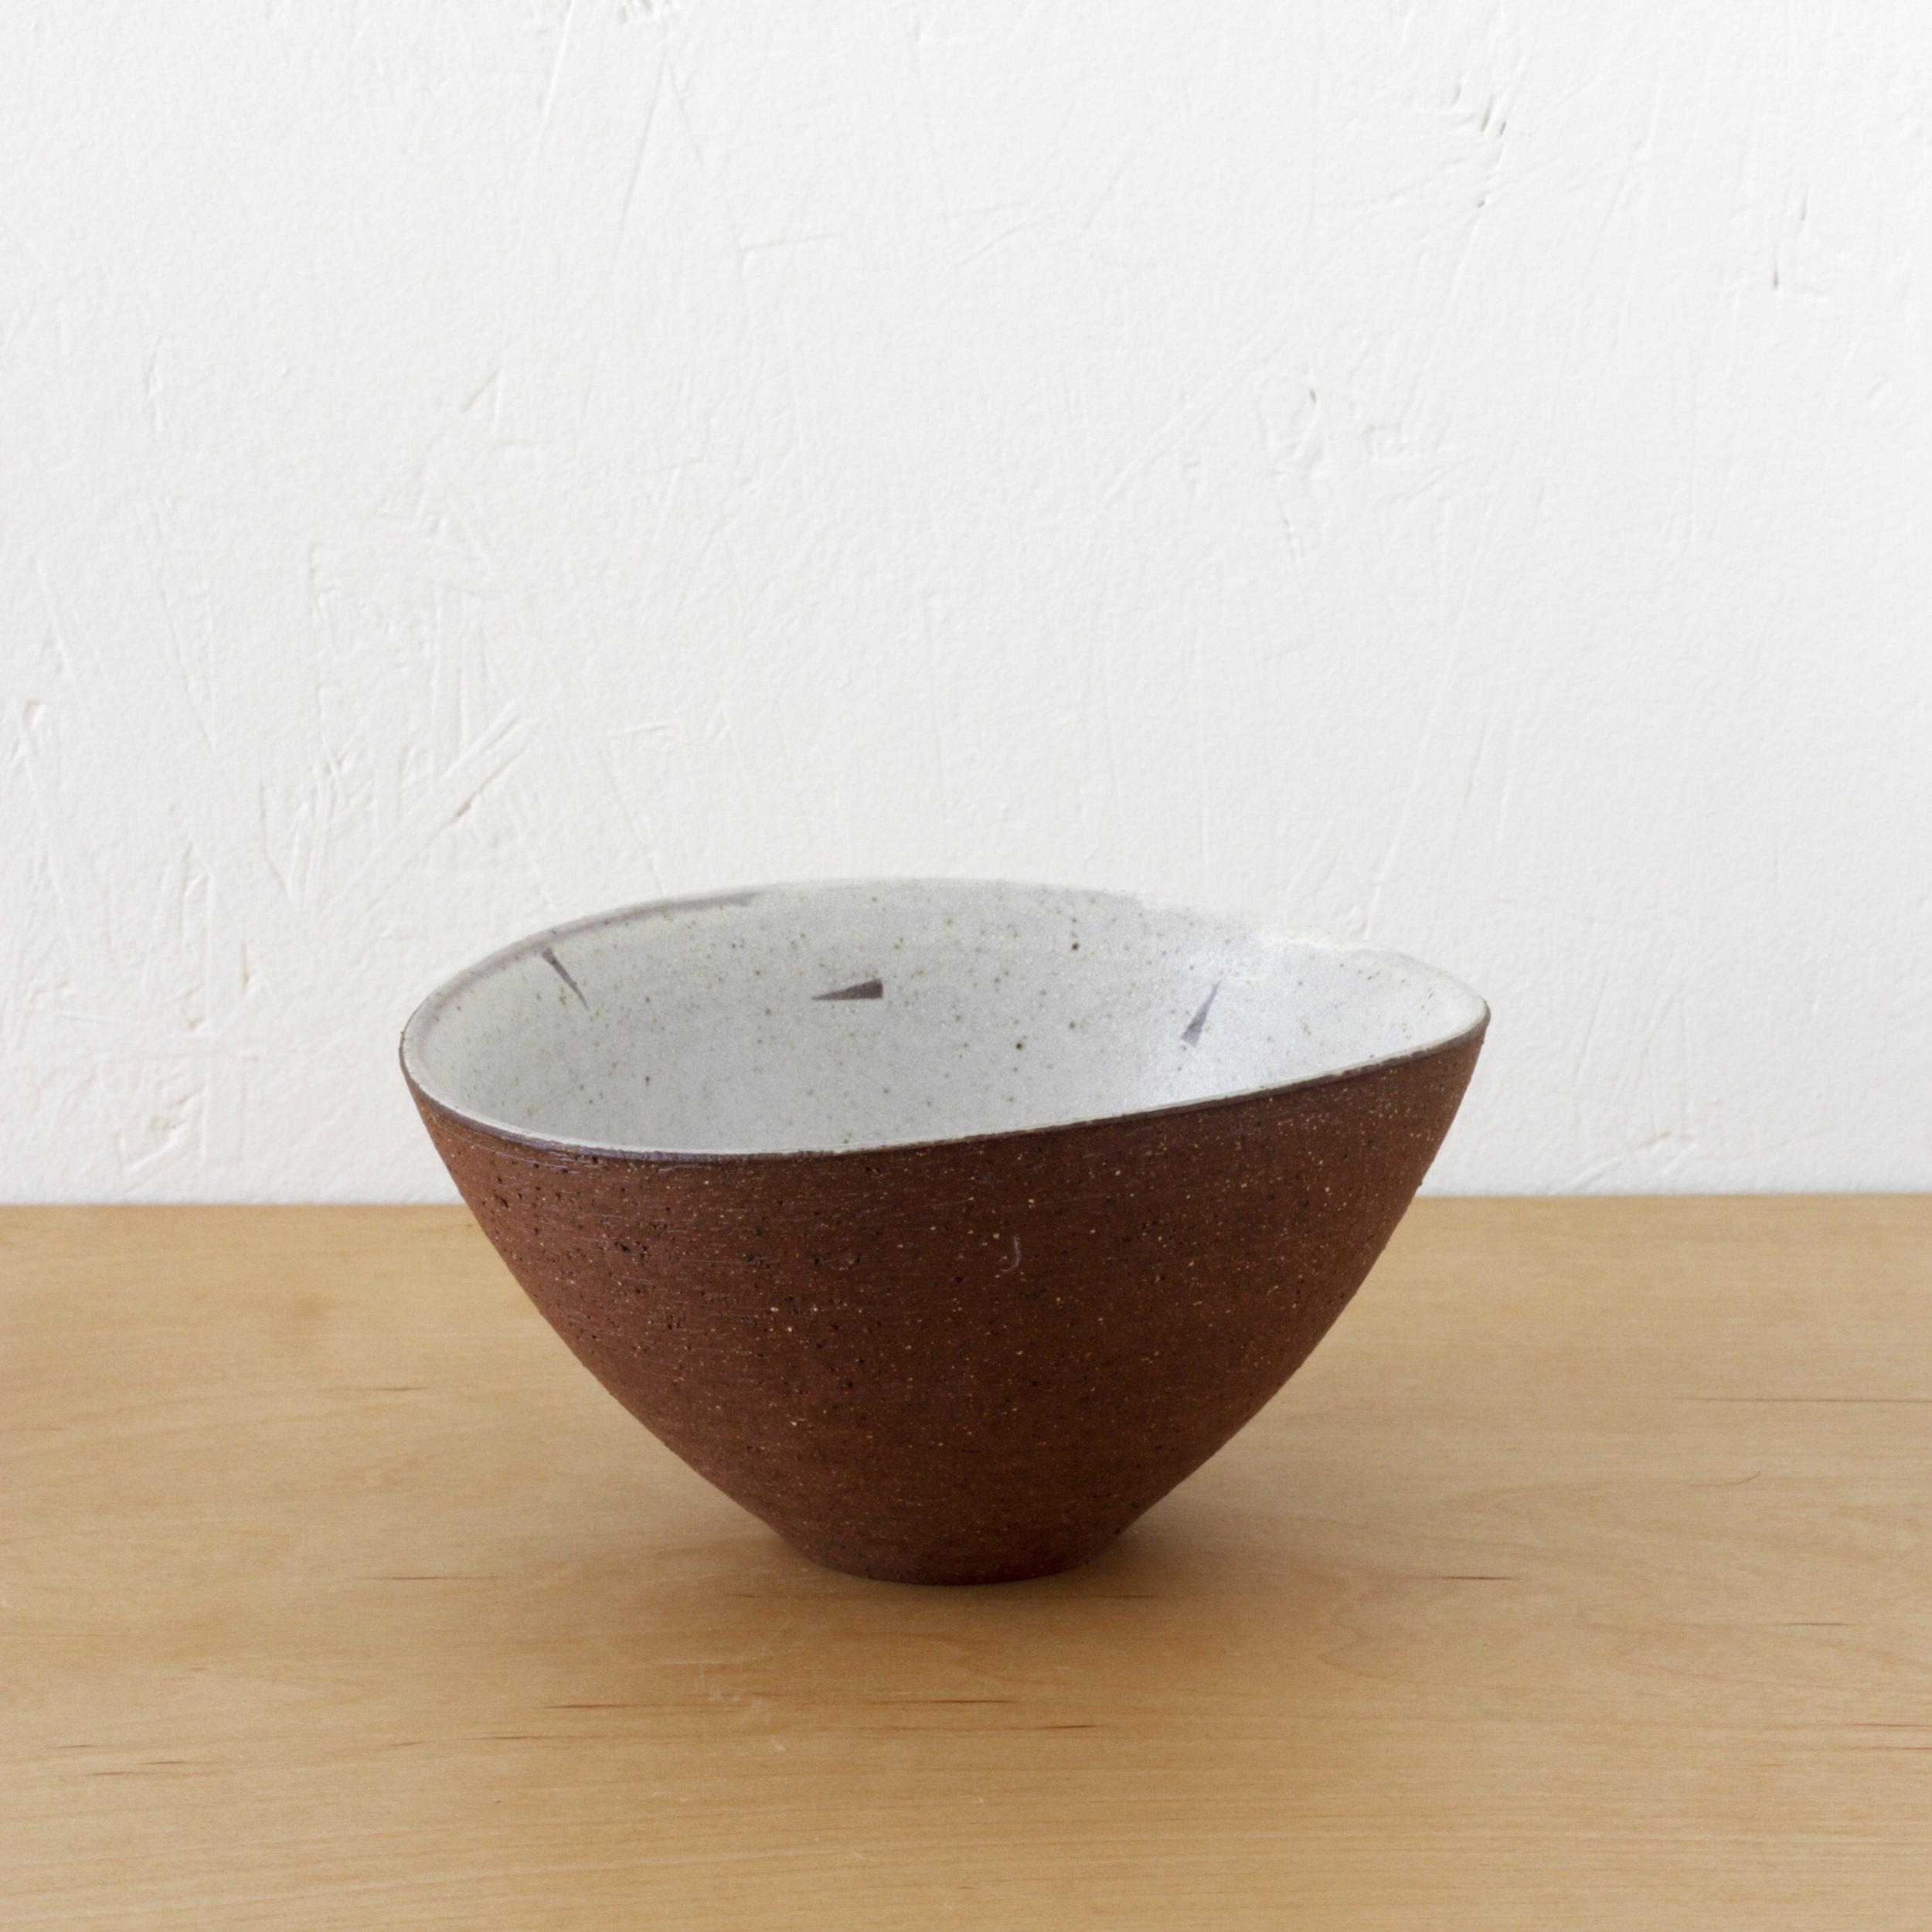 adamgruetzmacher_cerial_bowl3.jpg